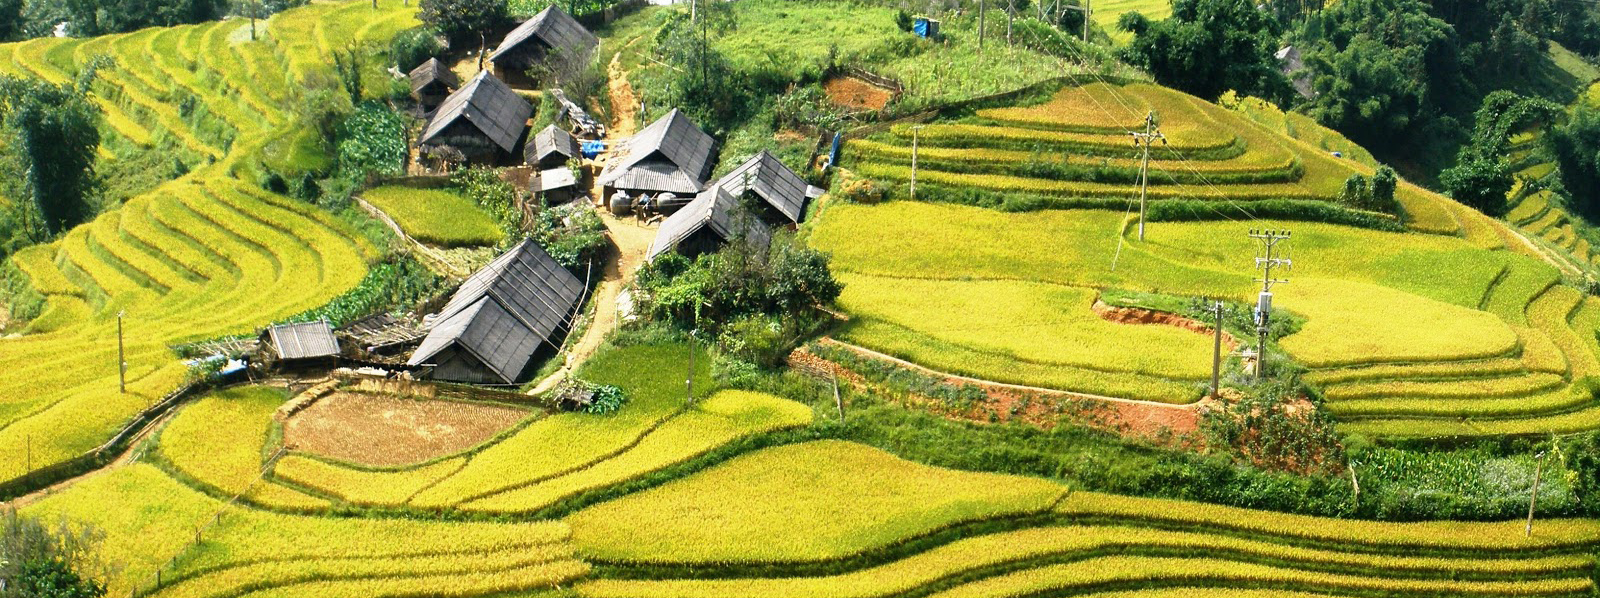 http://www.fareastour.fr/wp-content/uploads/2012/09/Lao-Chai-village-3.jpg